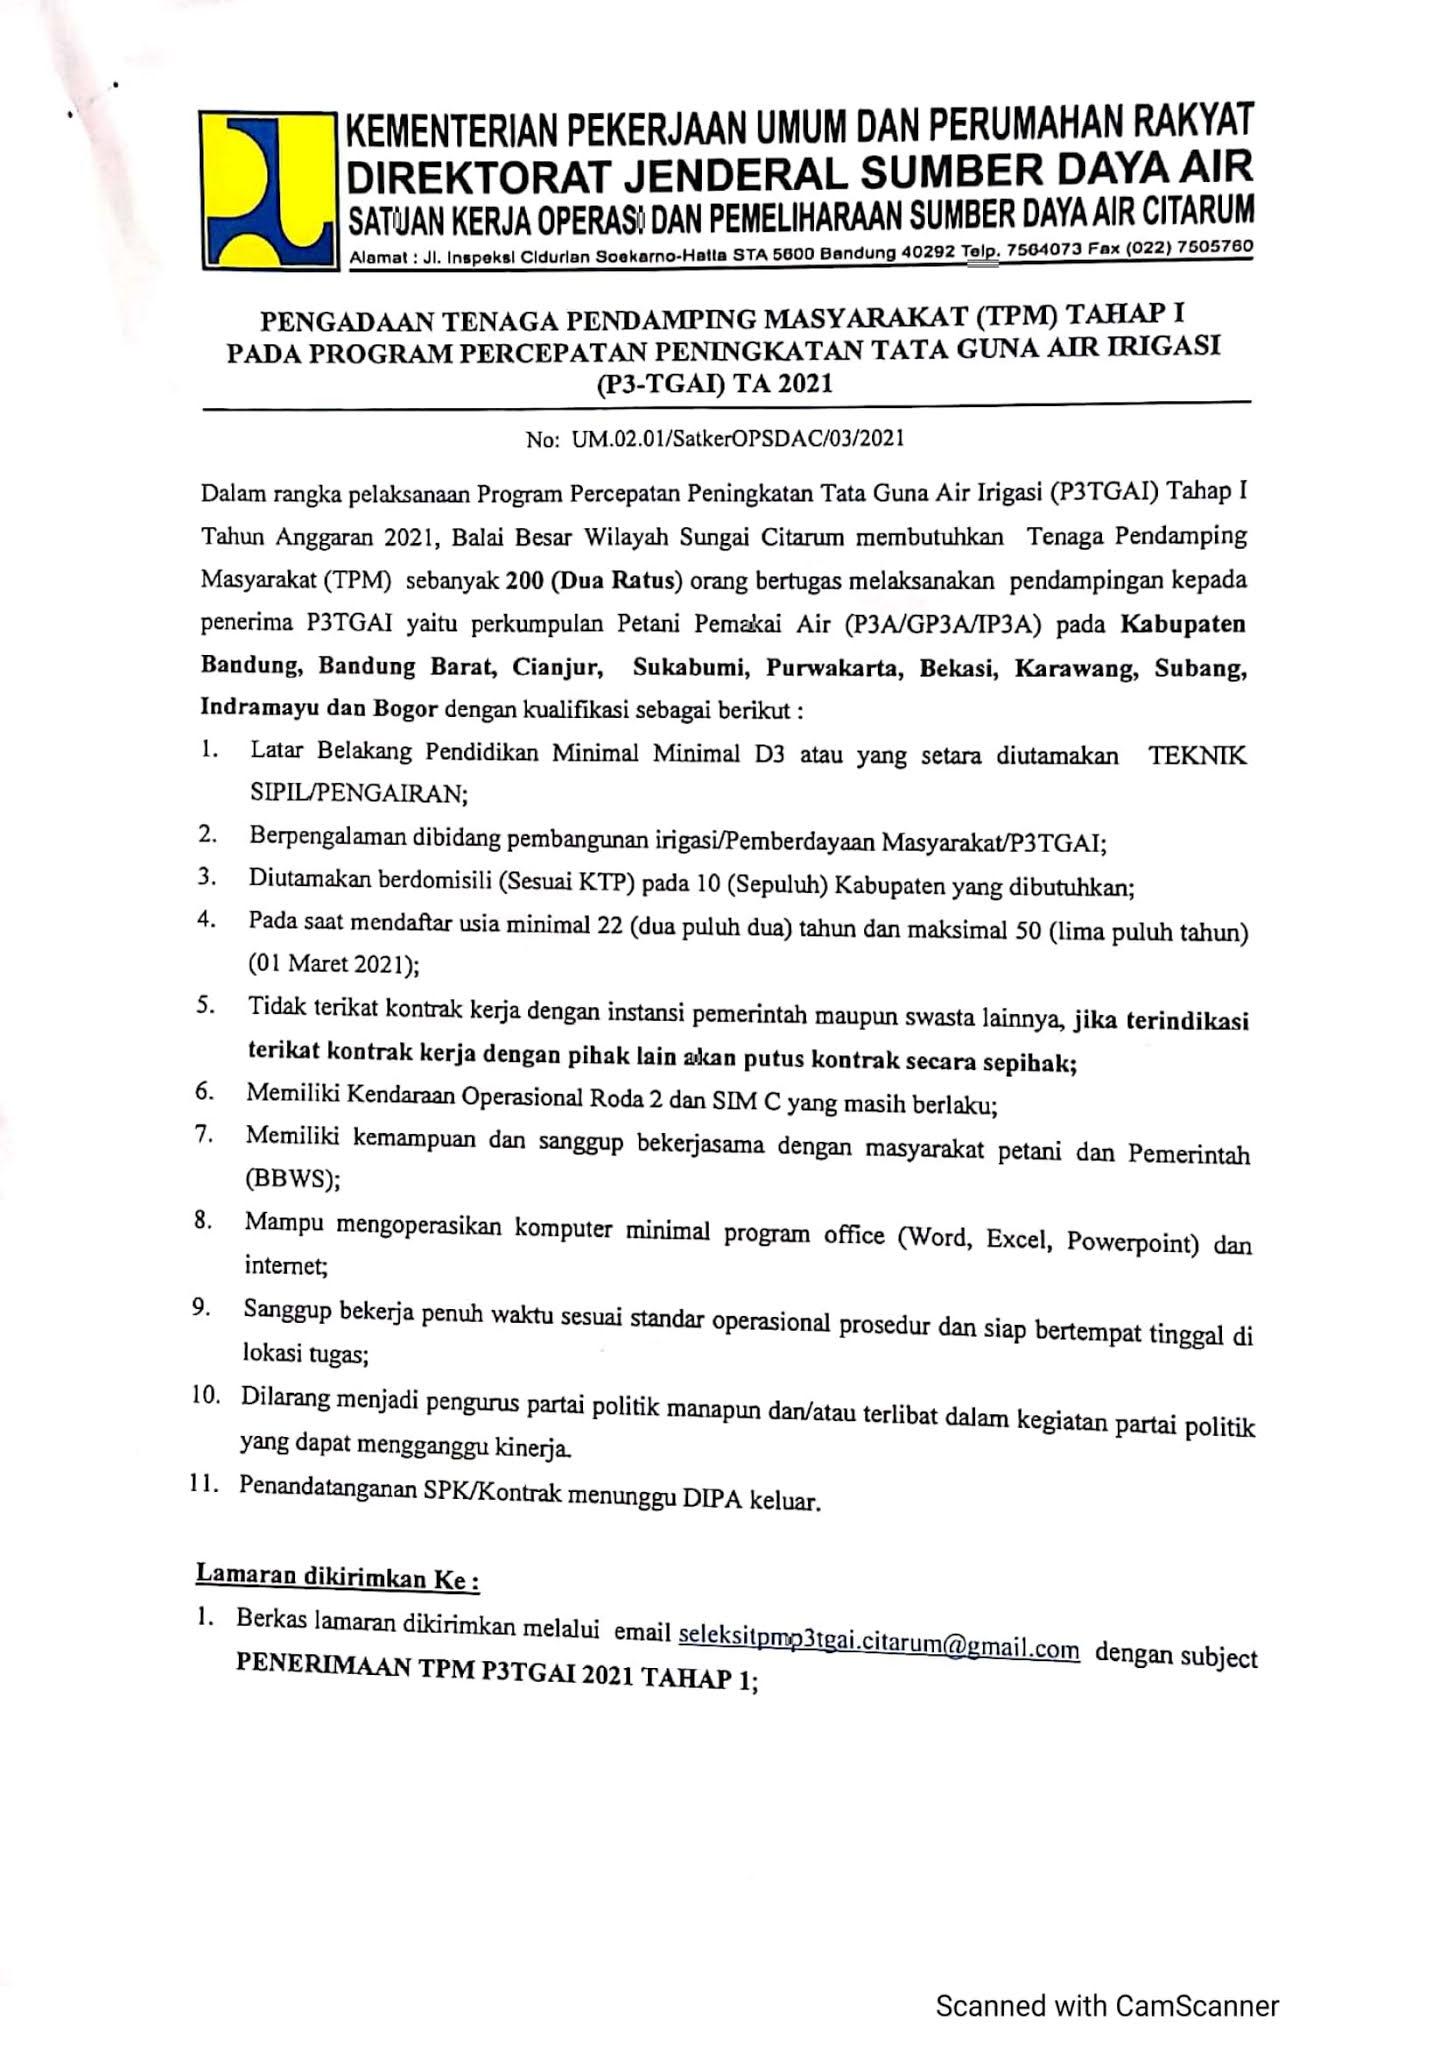 Lowongan Kerja Tenaga Pendamping Masyarakat Direktorat Jenderal Sumber Daya Air Kementerian PUPR Tahun 2021